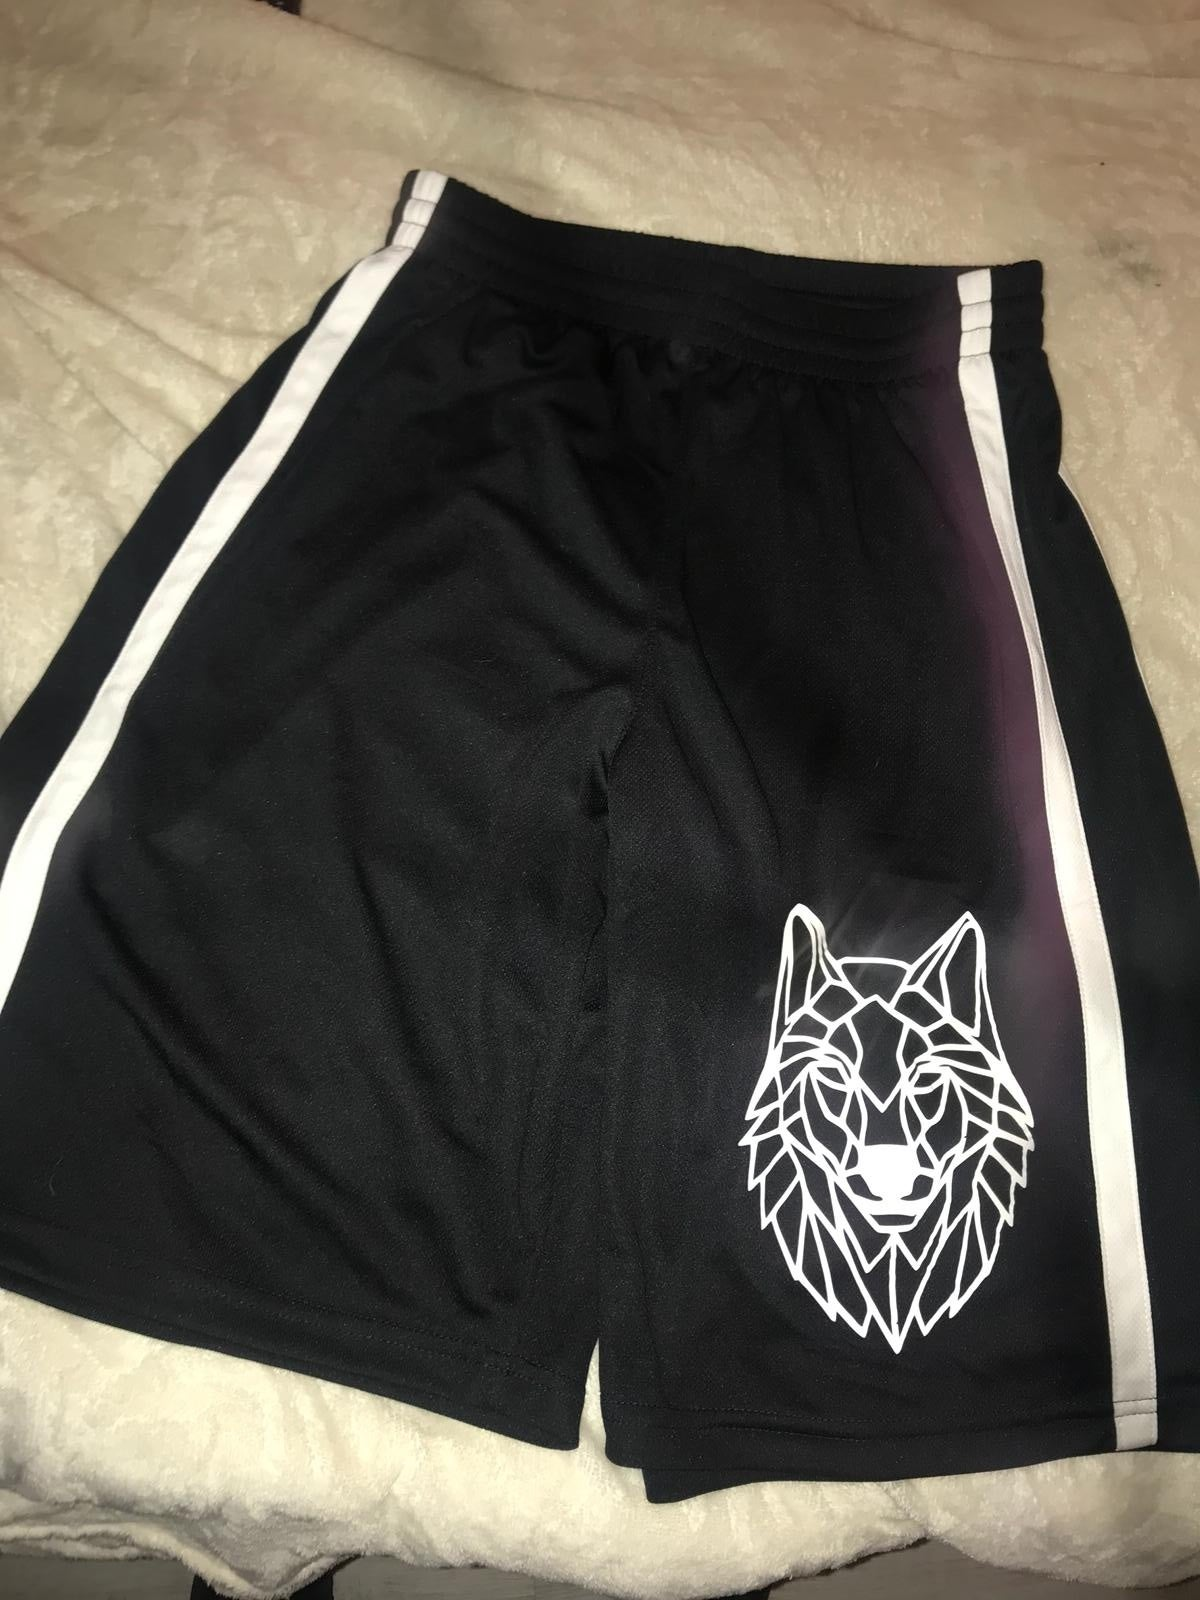 Image of The B'ball Shorts